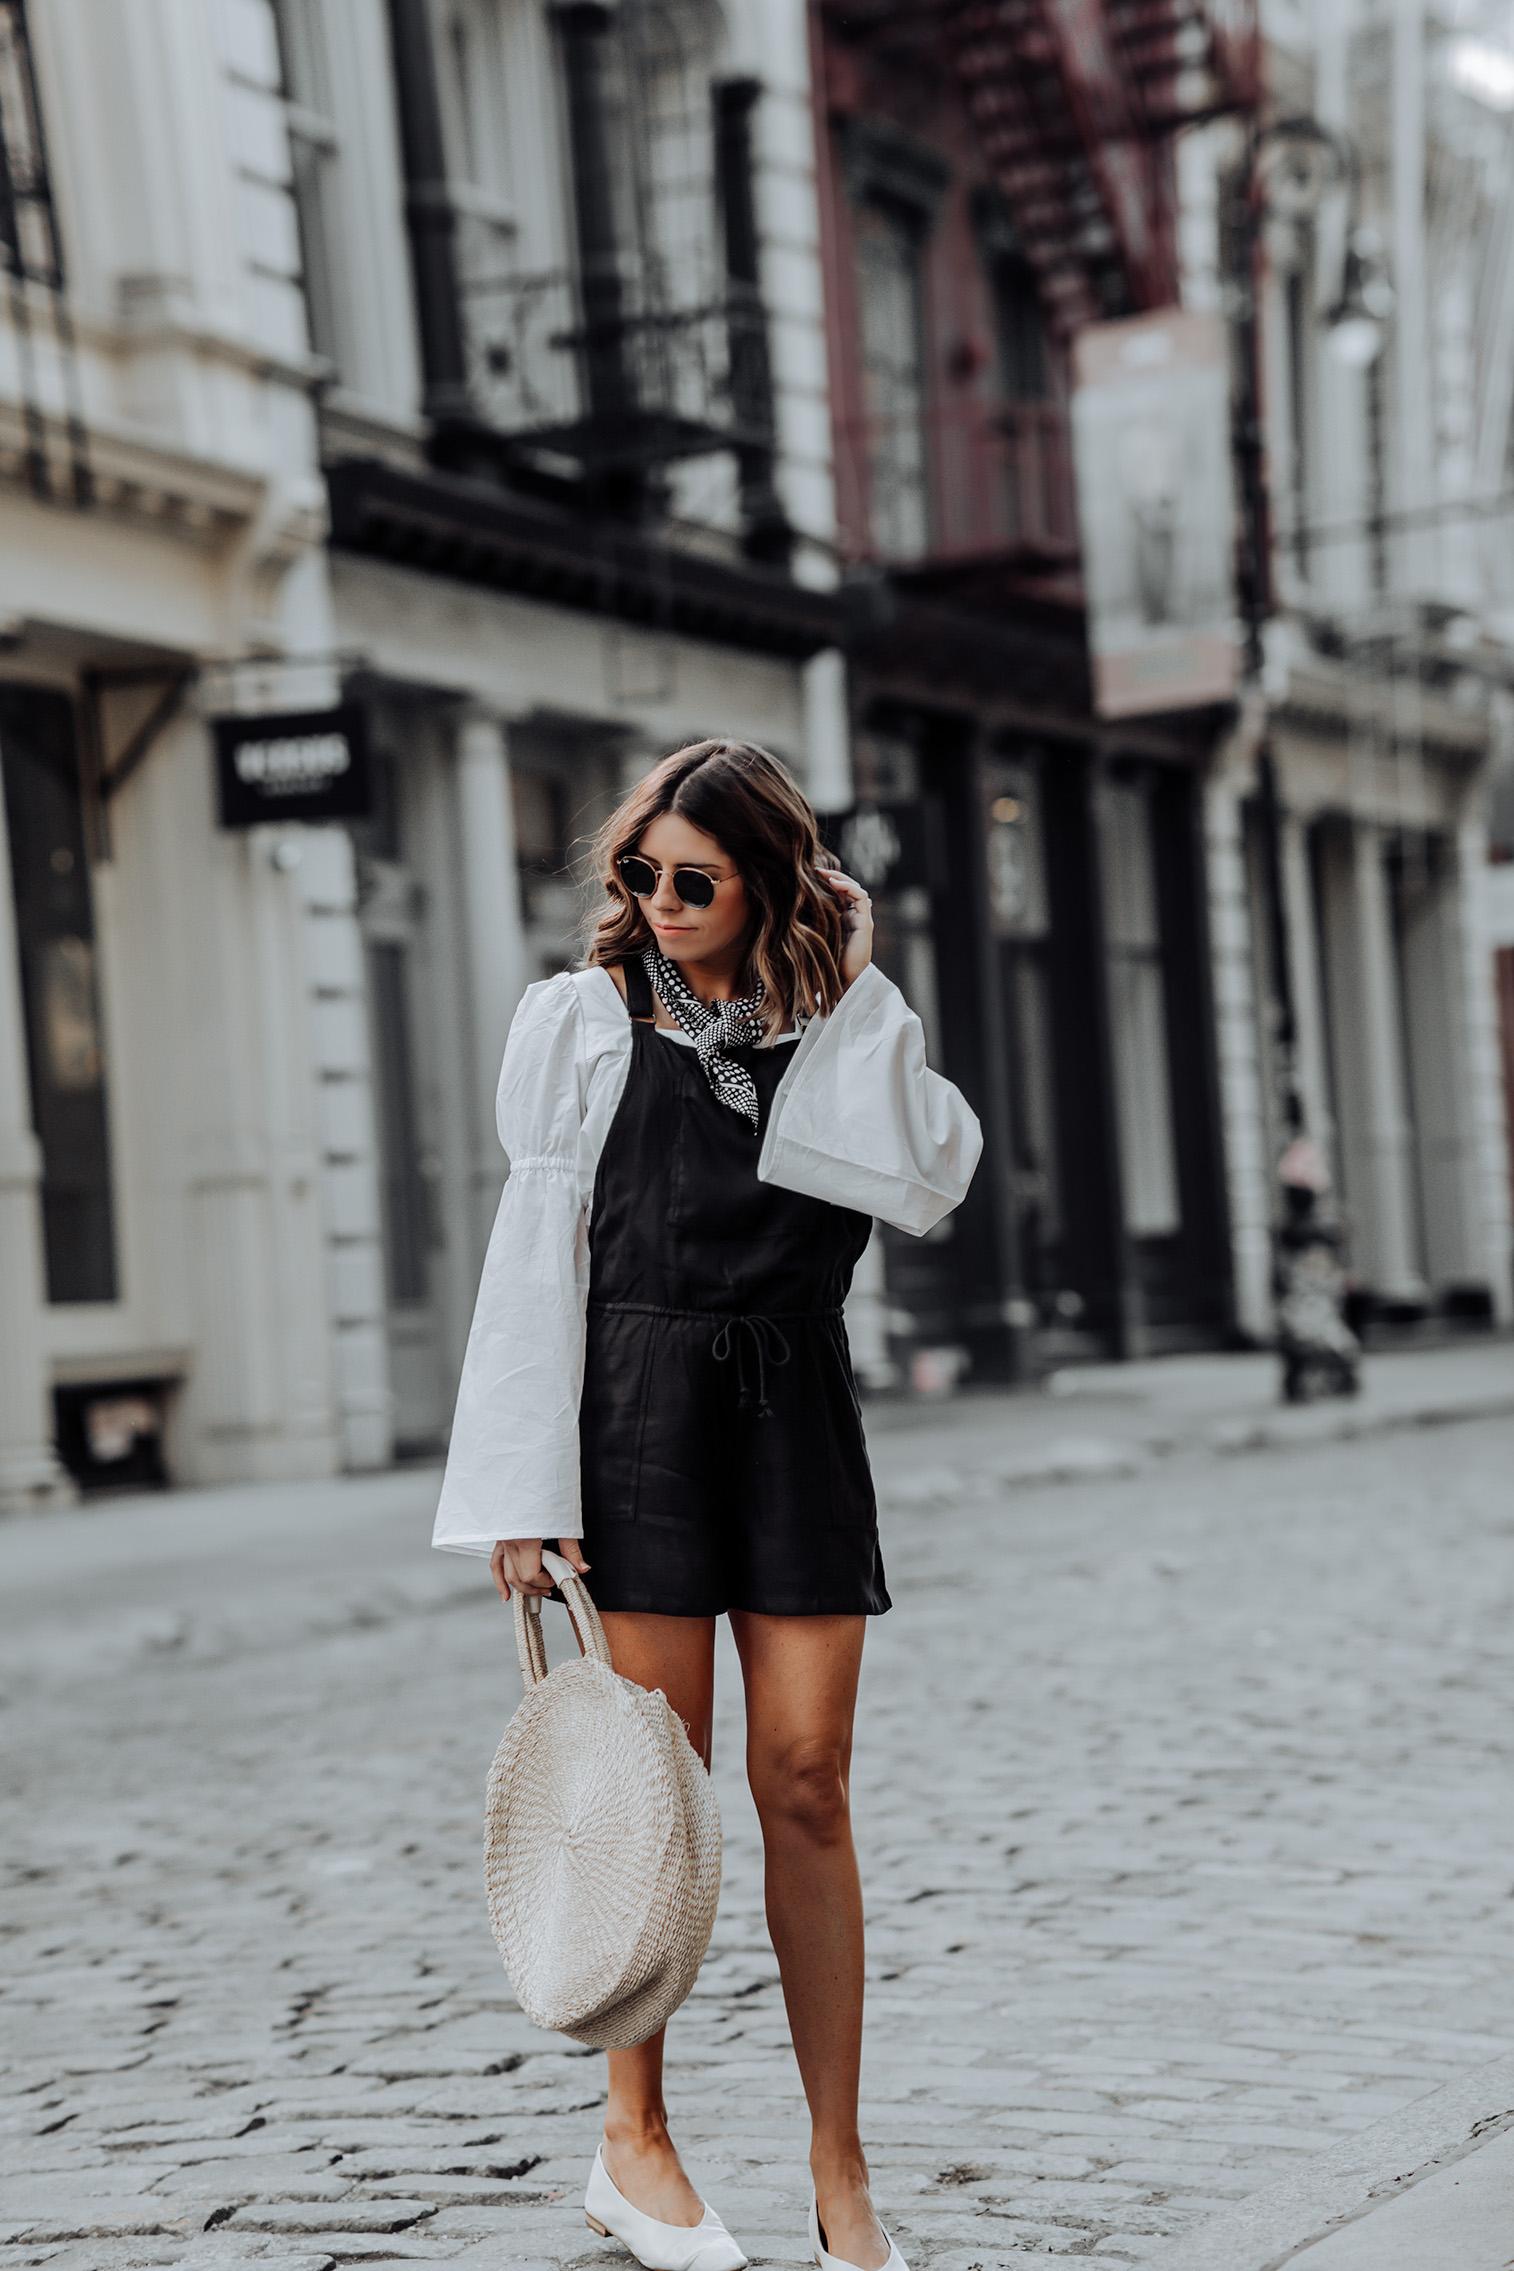 Tiffany Jais fashion and lifestyle blogger of Flaunt and Center | NYC fashion blogger | Kohl's outfit style | Streetstyle blog #liketkit #ootd #kohls #streetstyle